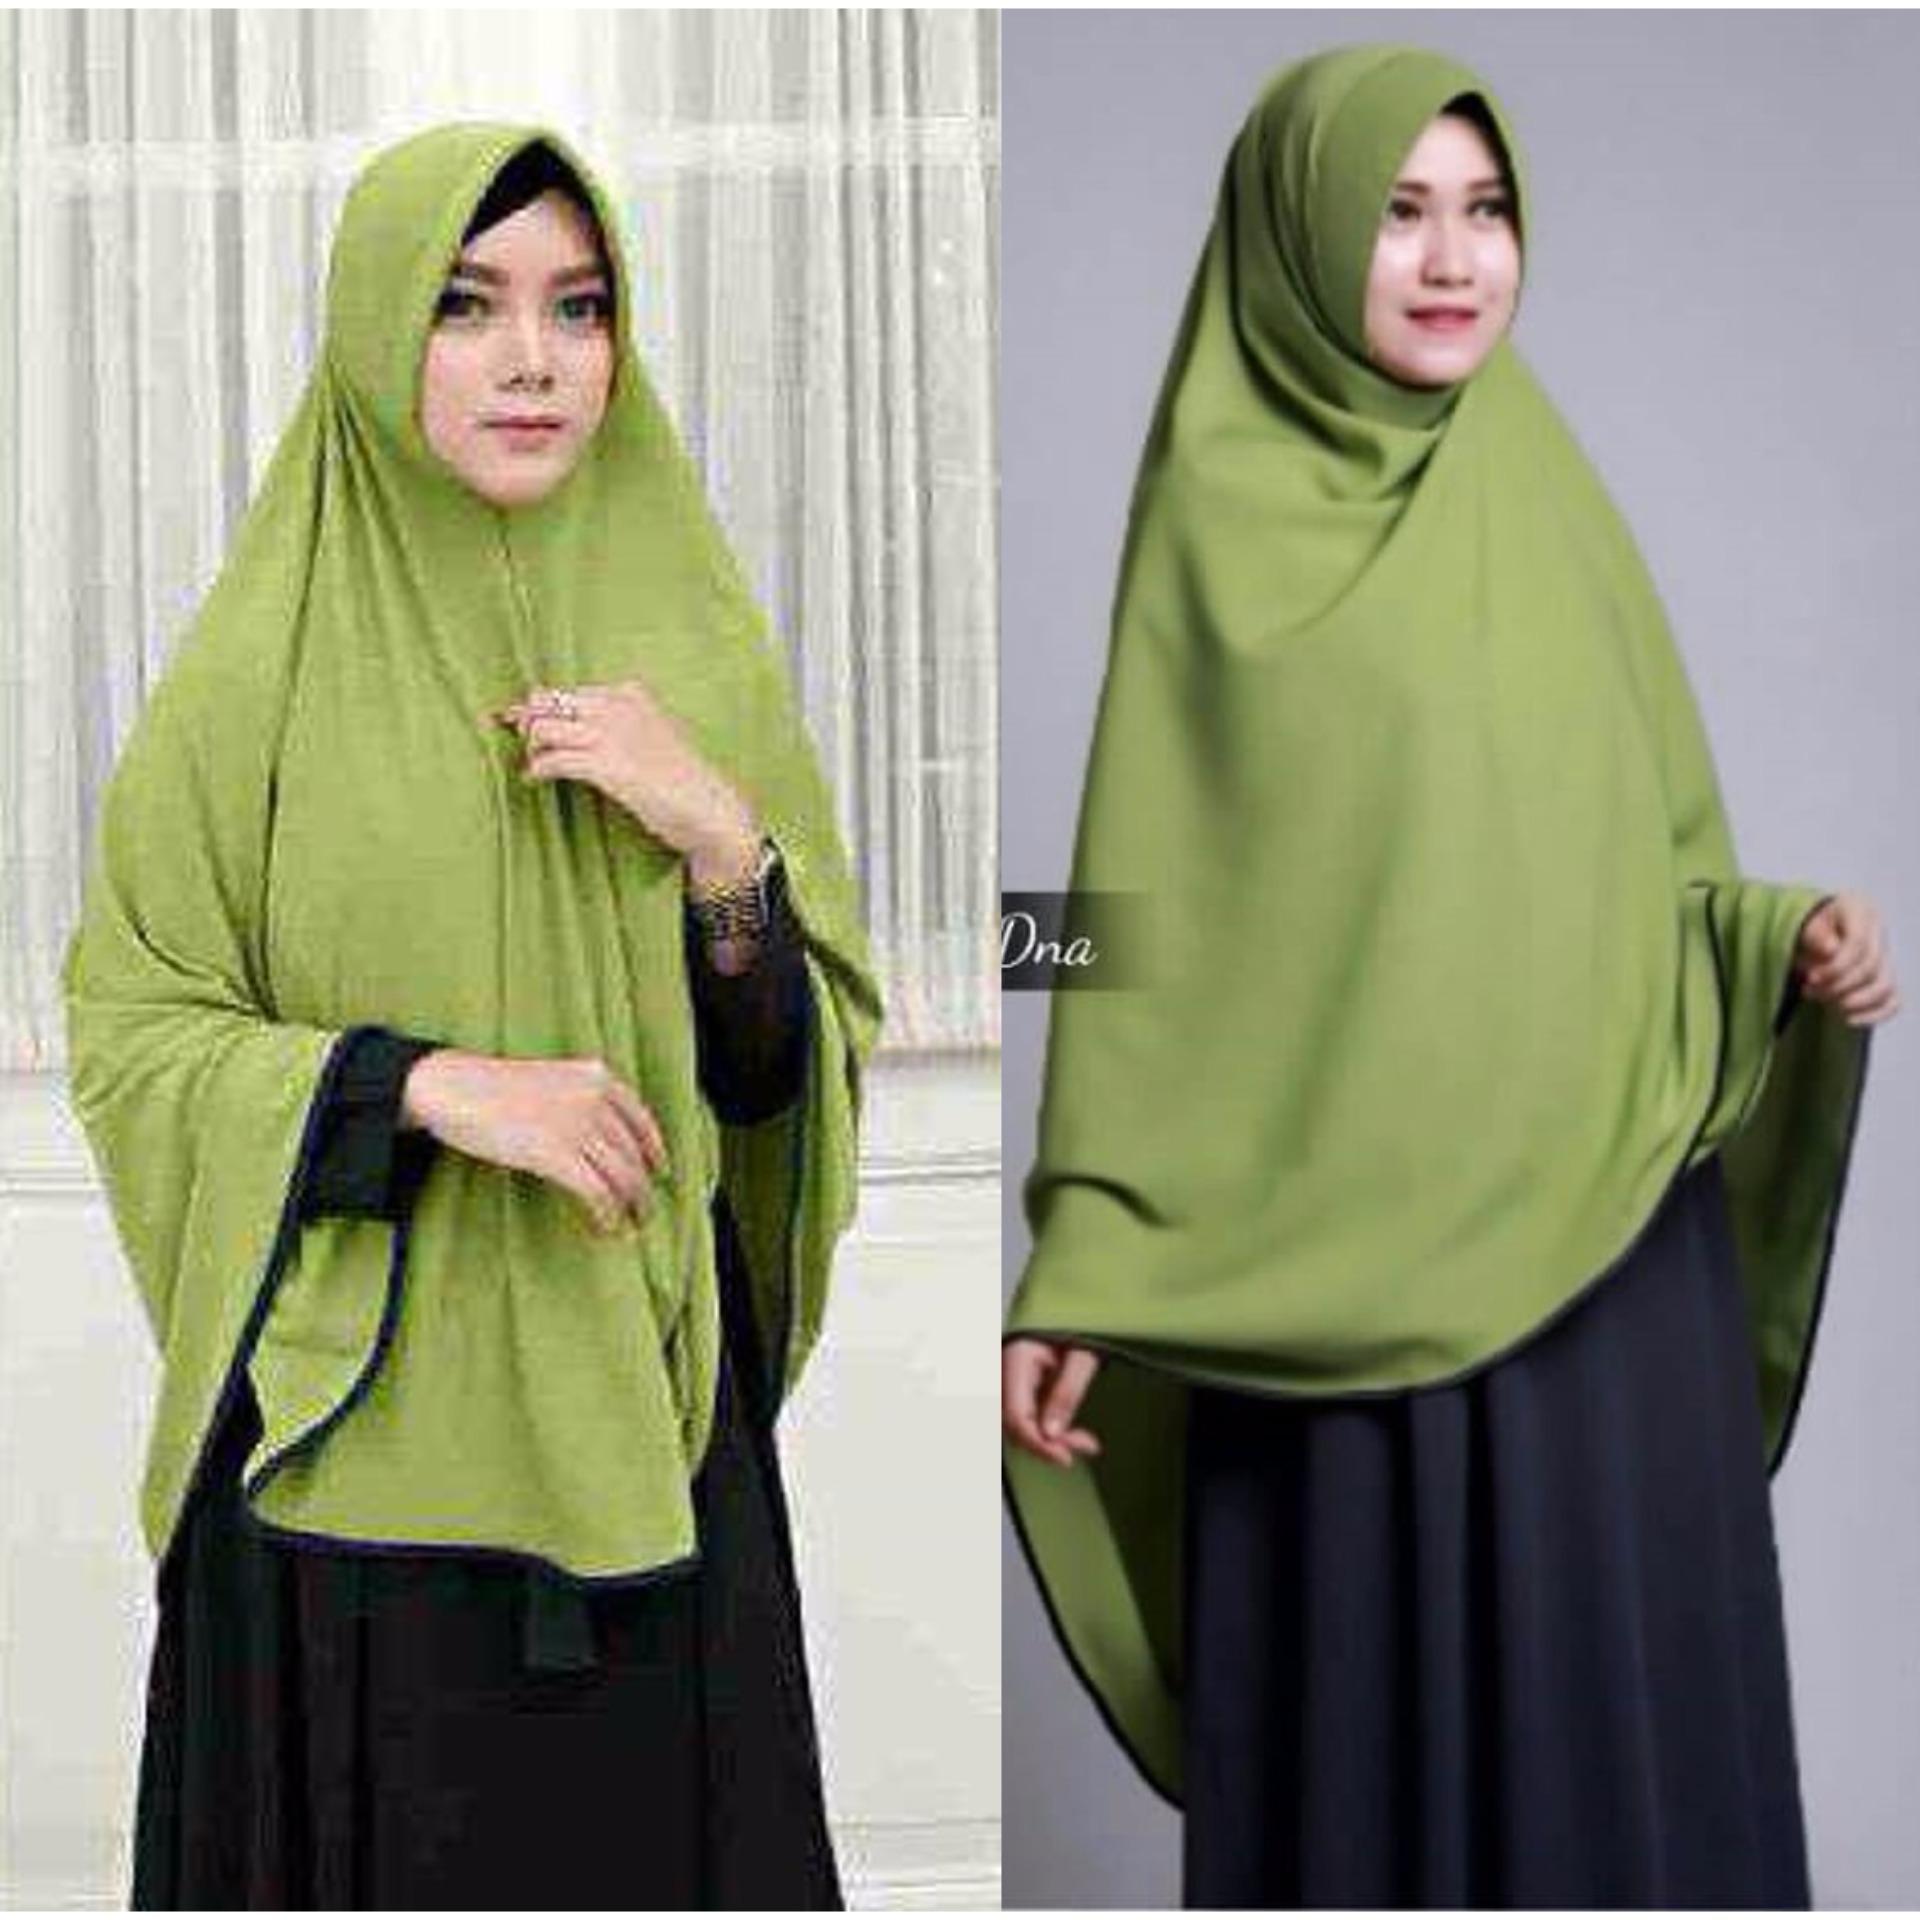 Premium Jilbab Syari Tanpa Pet Model Khimar Dhea Free Bross Pita Hijab Ainun Instant Aneka Warna Toko Berkah Online